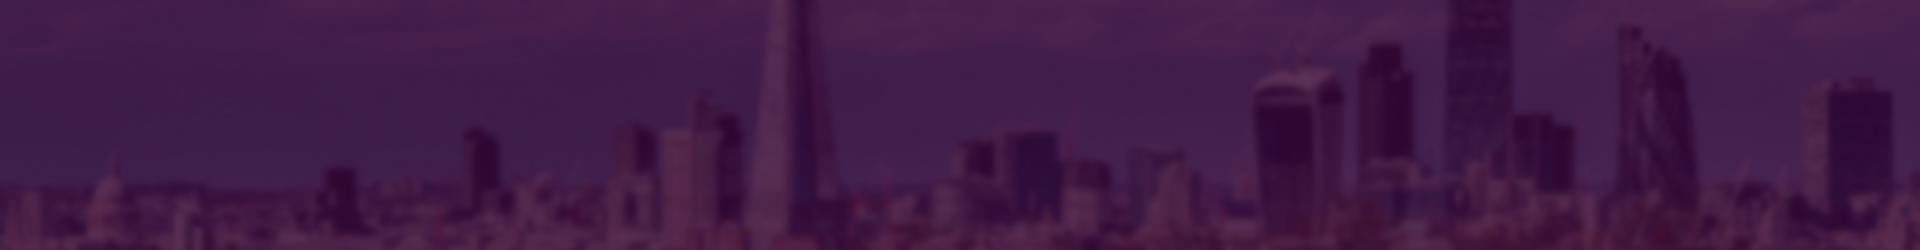 vuelio-background-purple-1920x250px